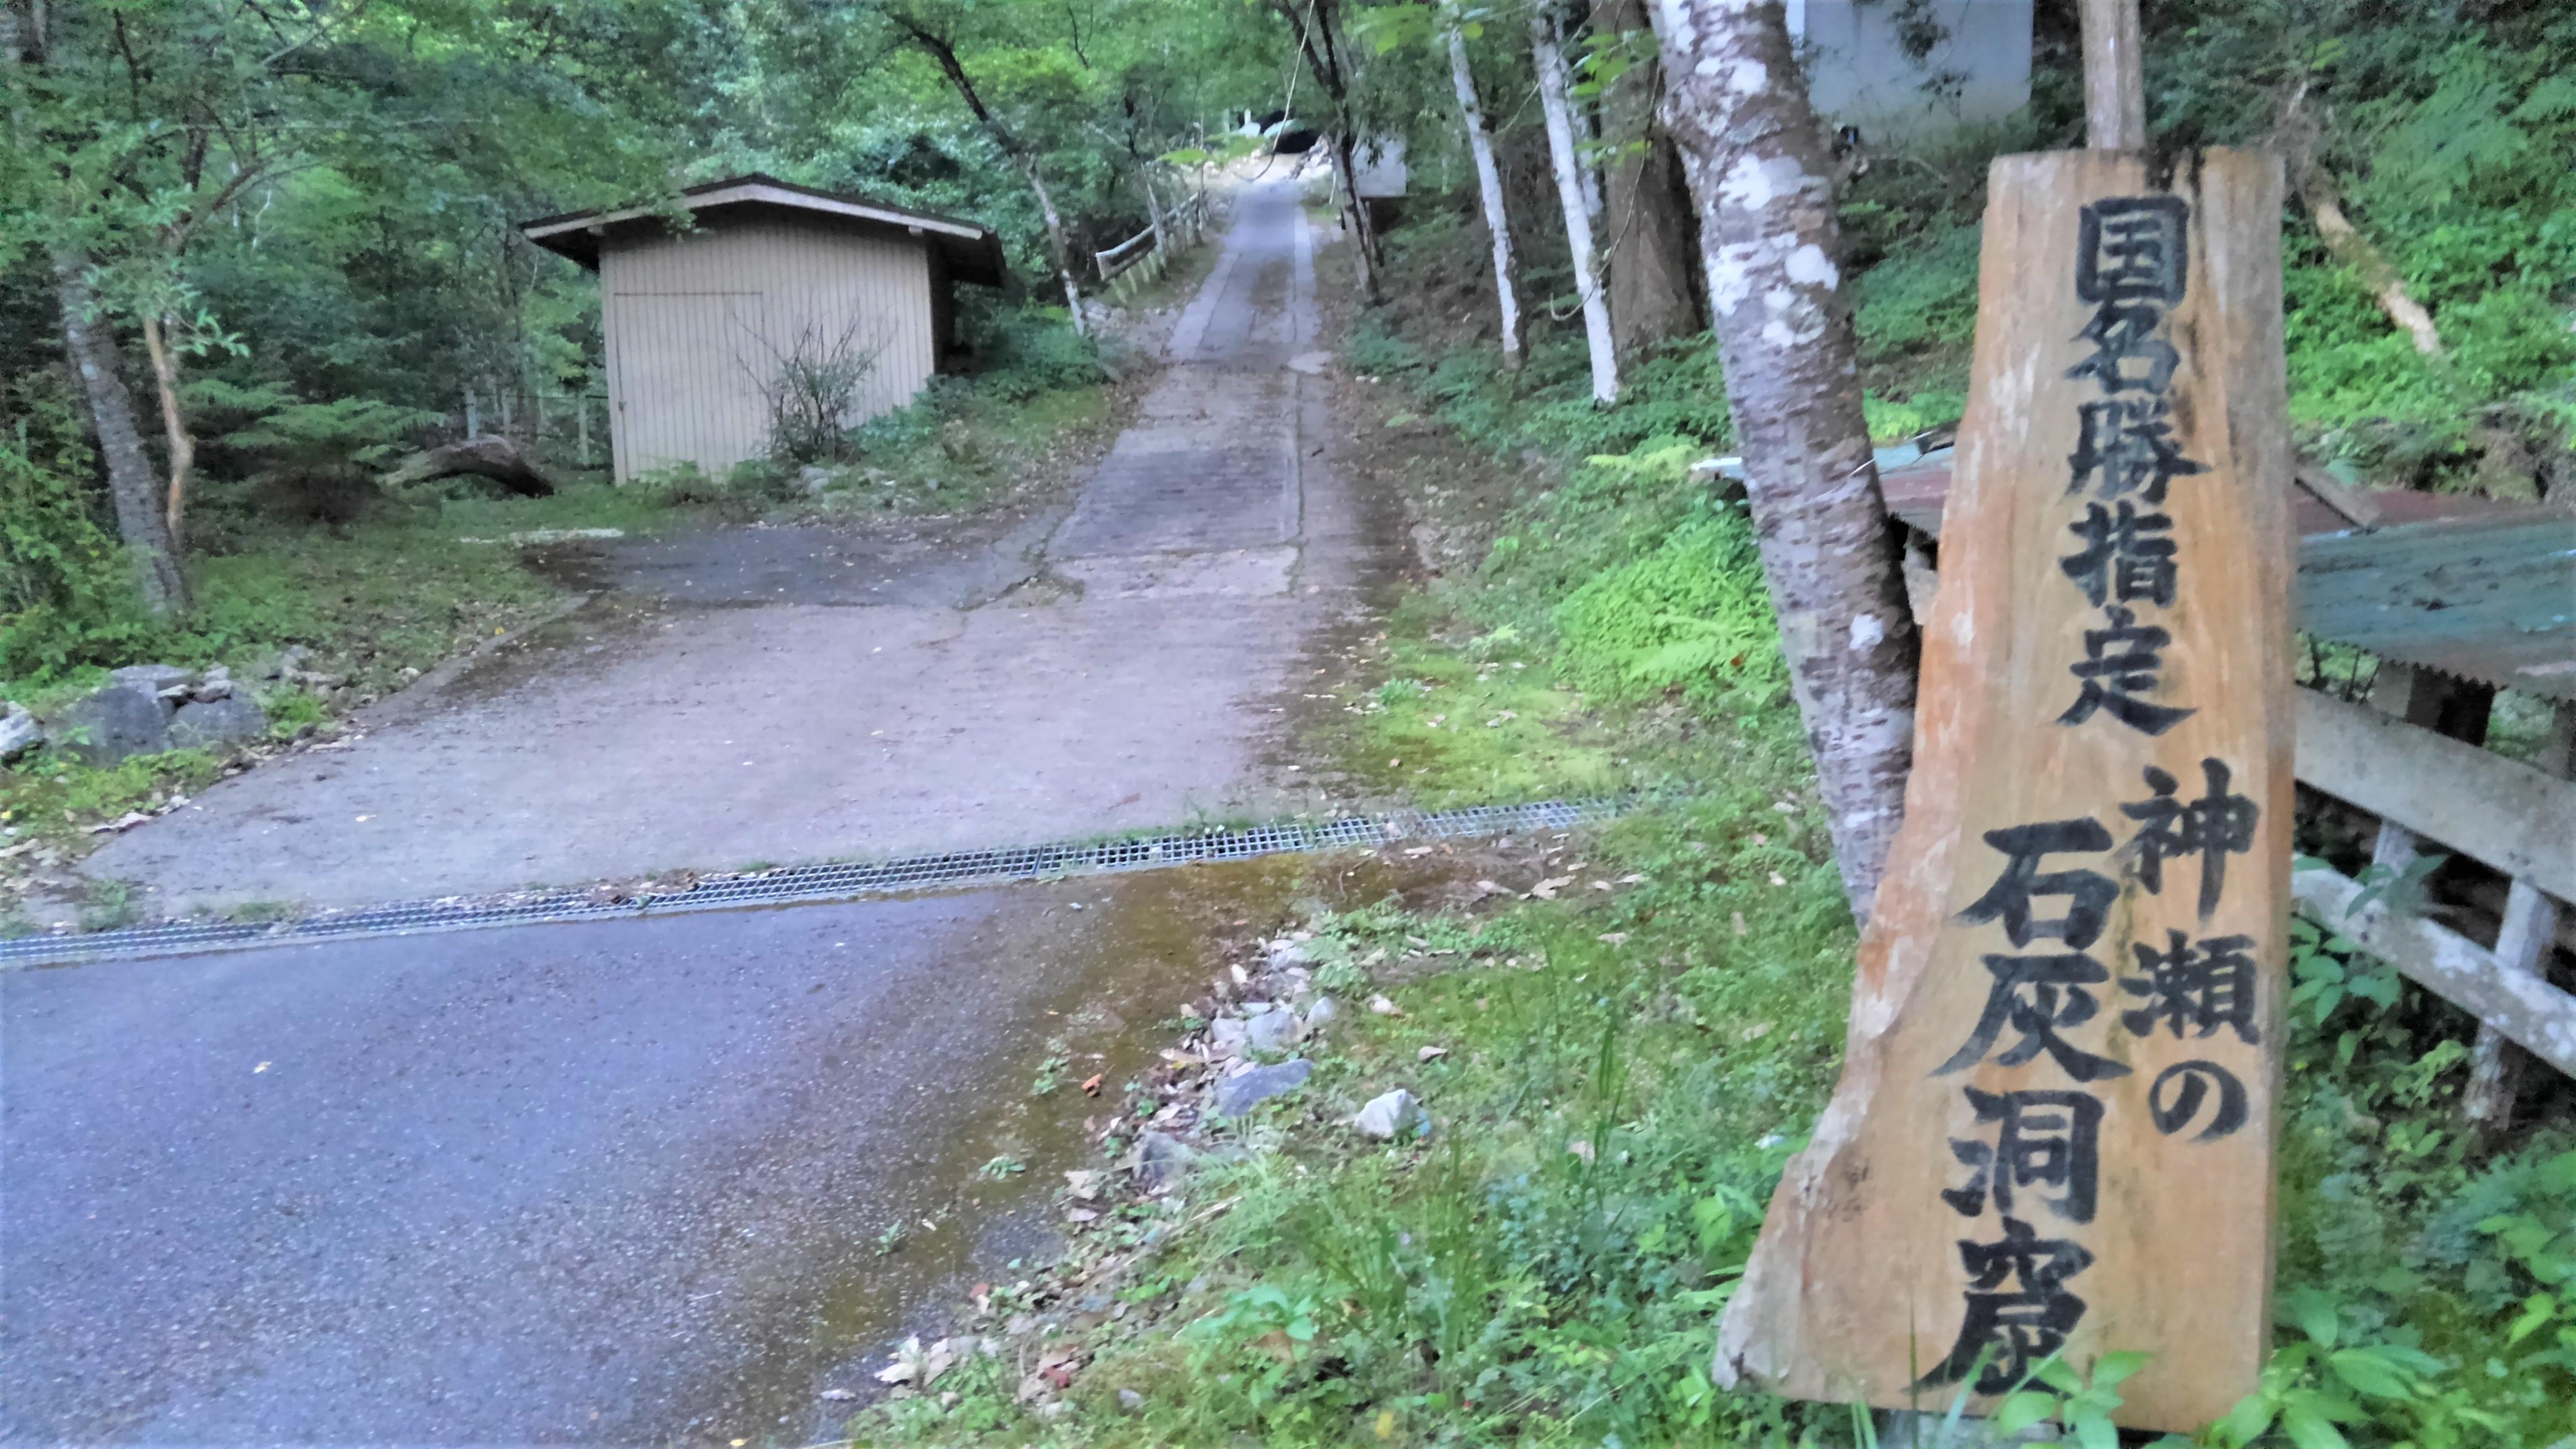 神瀬鍾乳洞 熊野座神社 入り口